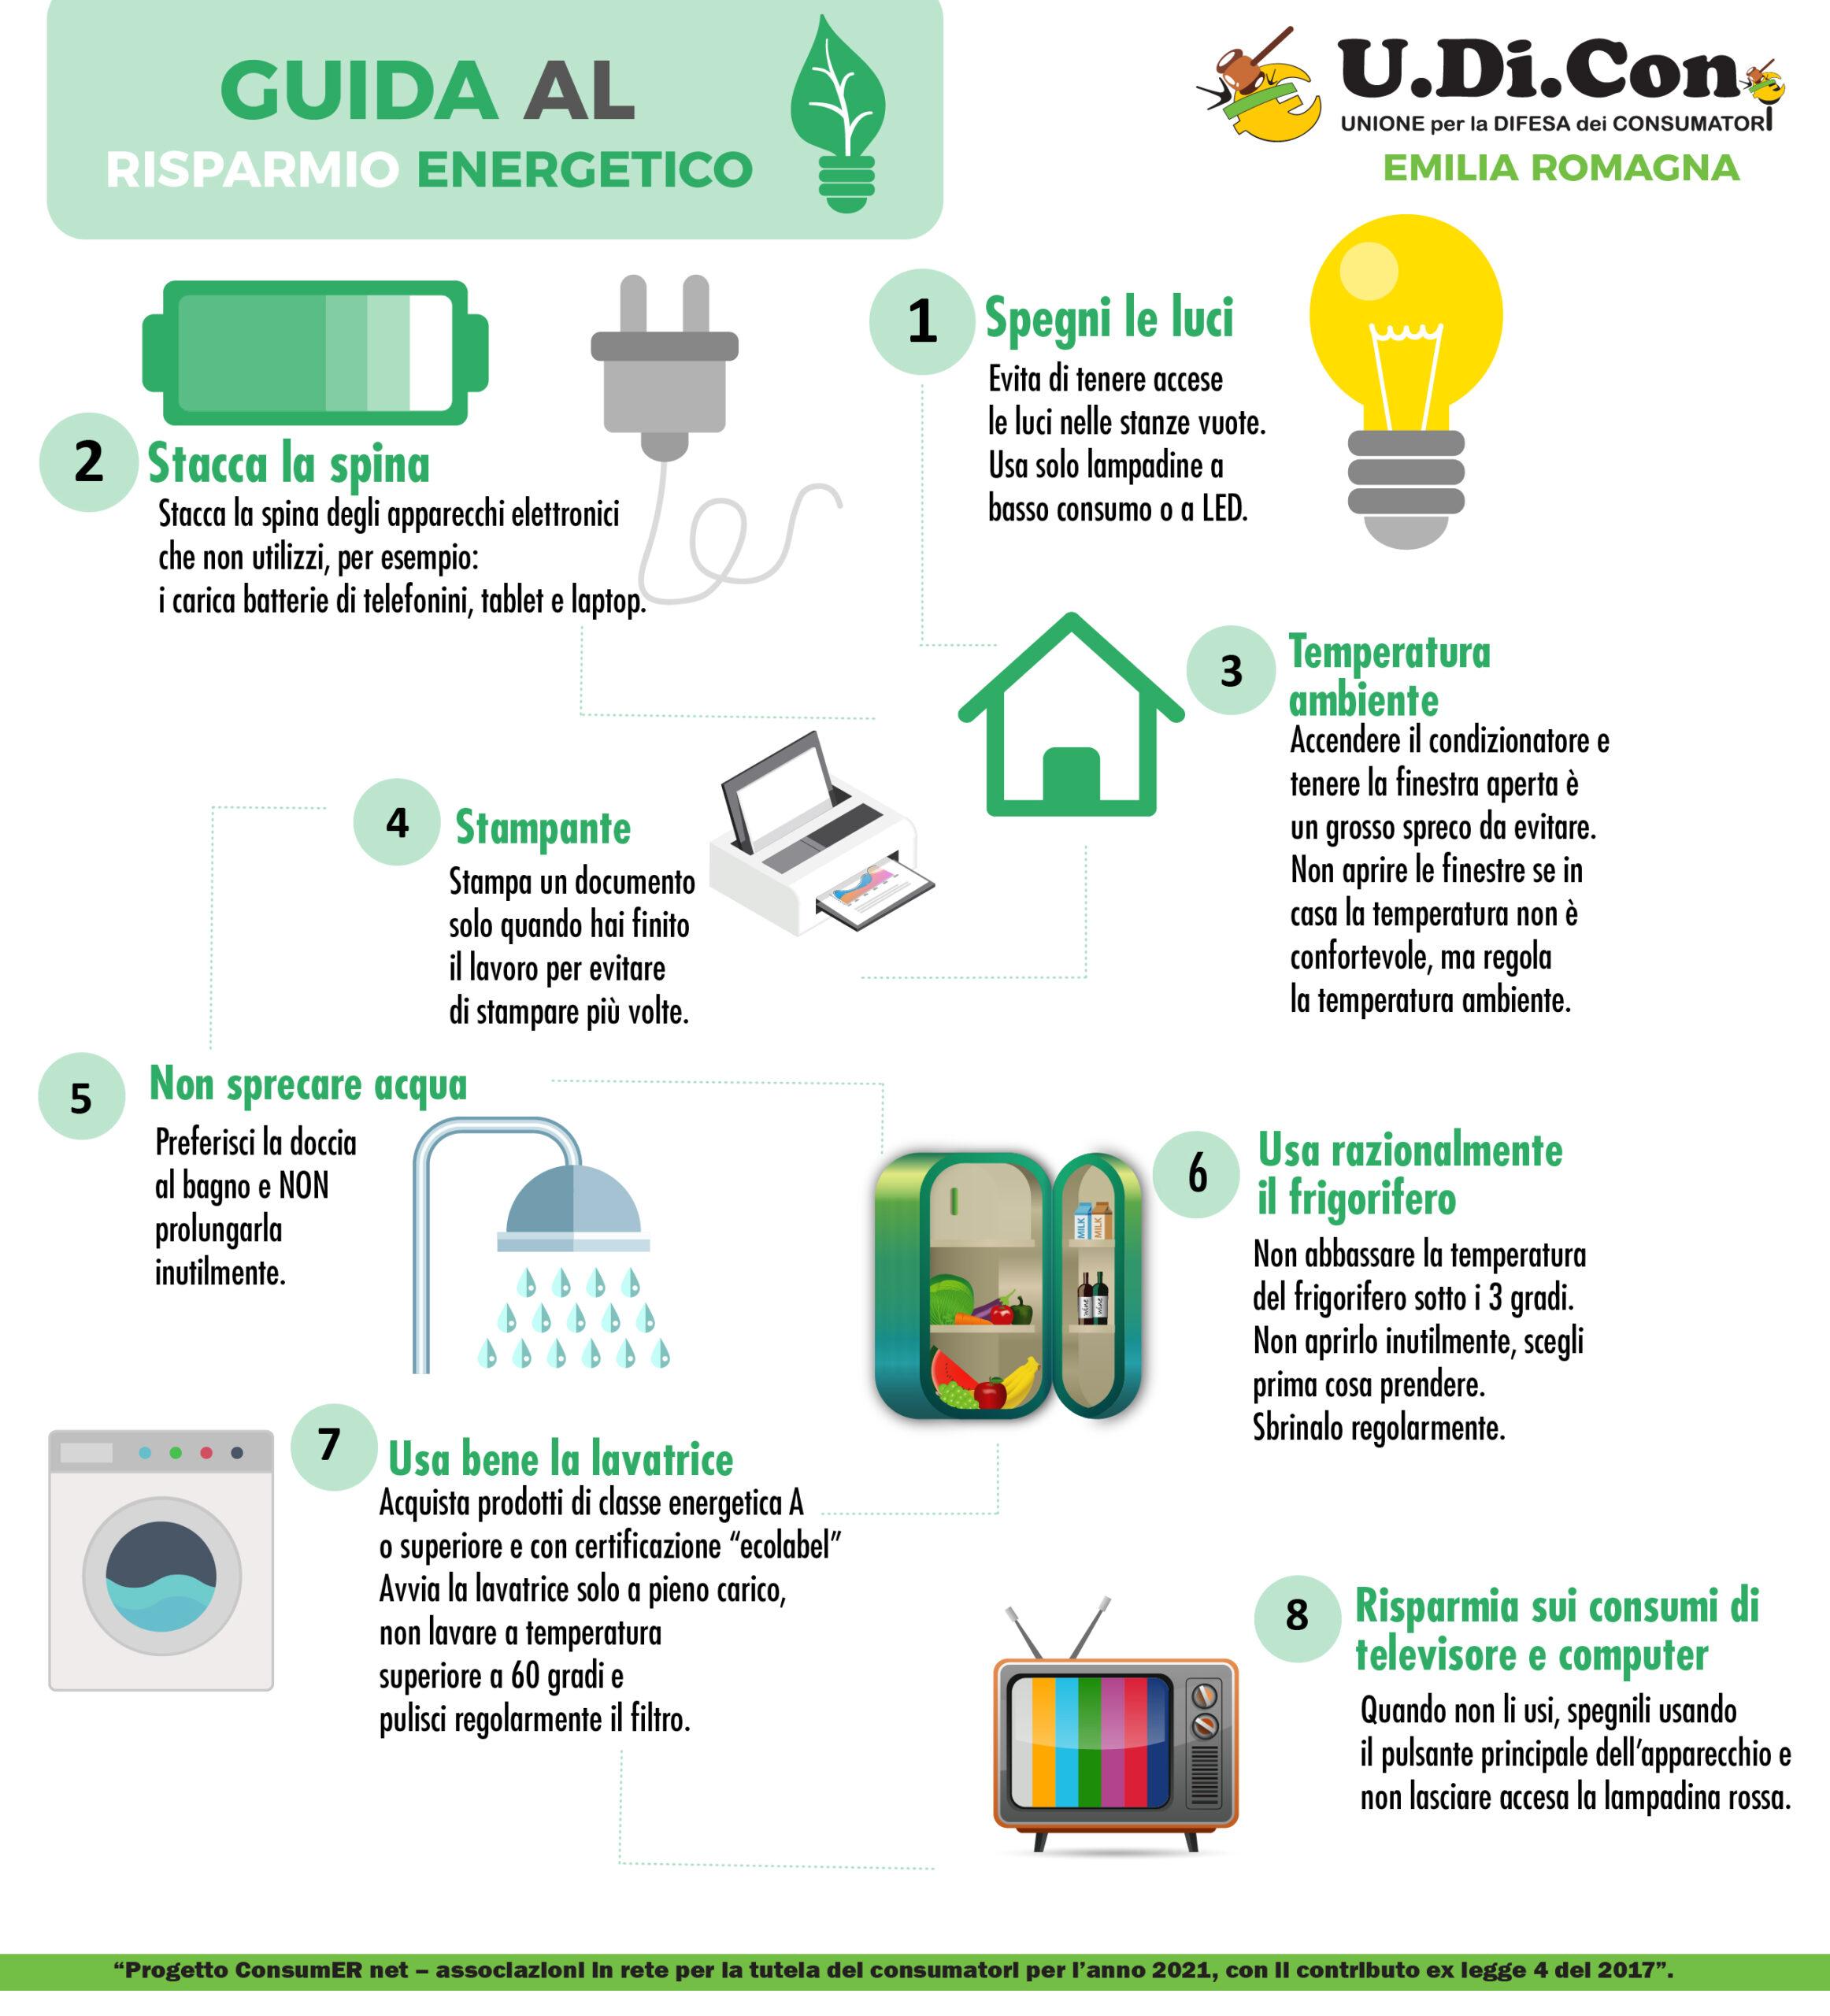 Infografica - Guida al risparmio energetico